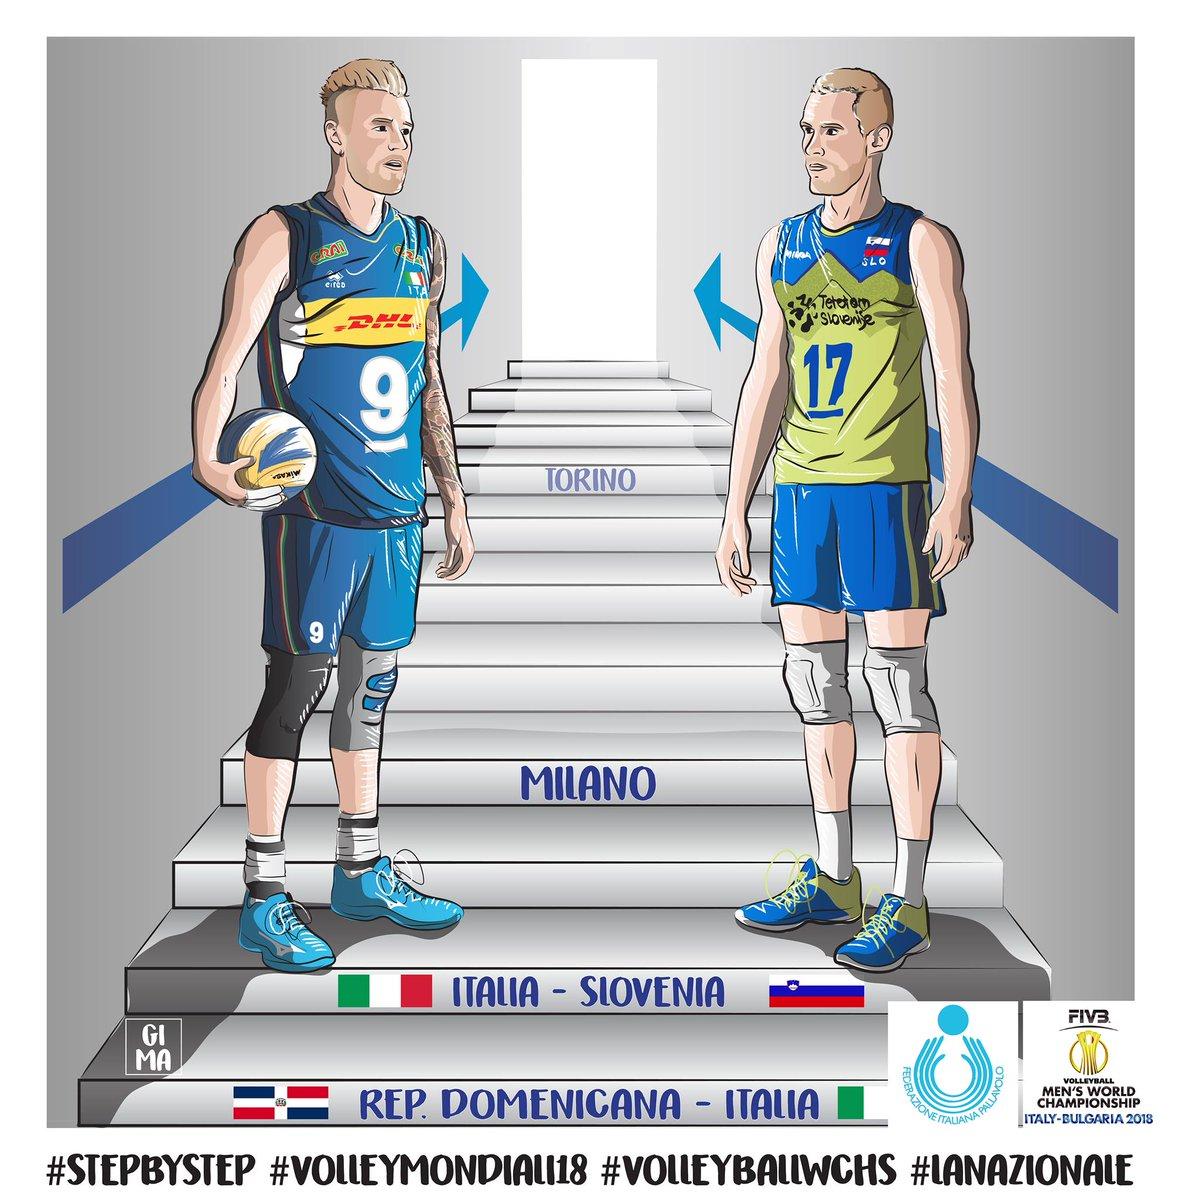 Mondiali: Step by step, stasera tocca a Italia-Slovenia  https:// www.volleyball.it/mondiali-step-by-step-stasera-tocca-a-italia-slovenia/ #FivbMensWCH #iotifoazzurro #volleyball #VolleyballWChs #VolleyMondiali18 #LaNazionale leggilo su https://t.co/VcBPGLNNCB  - Ukustom